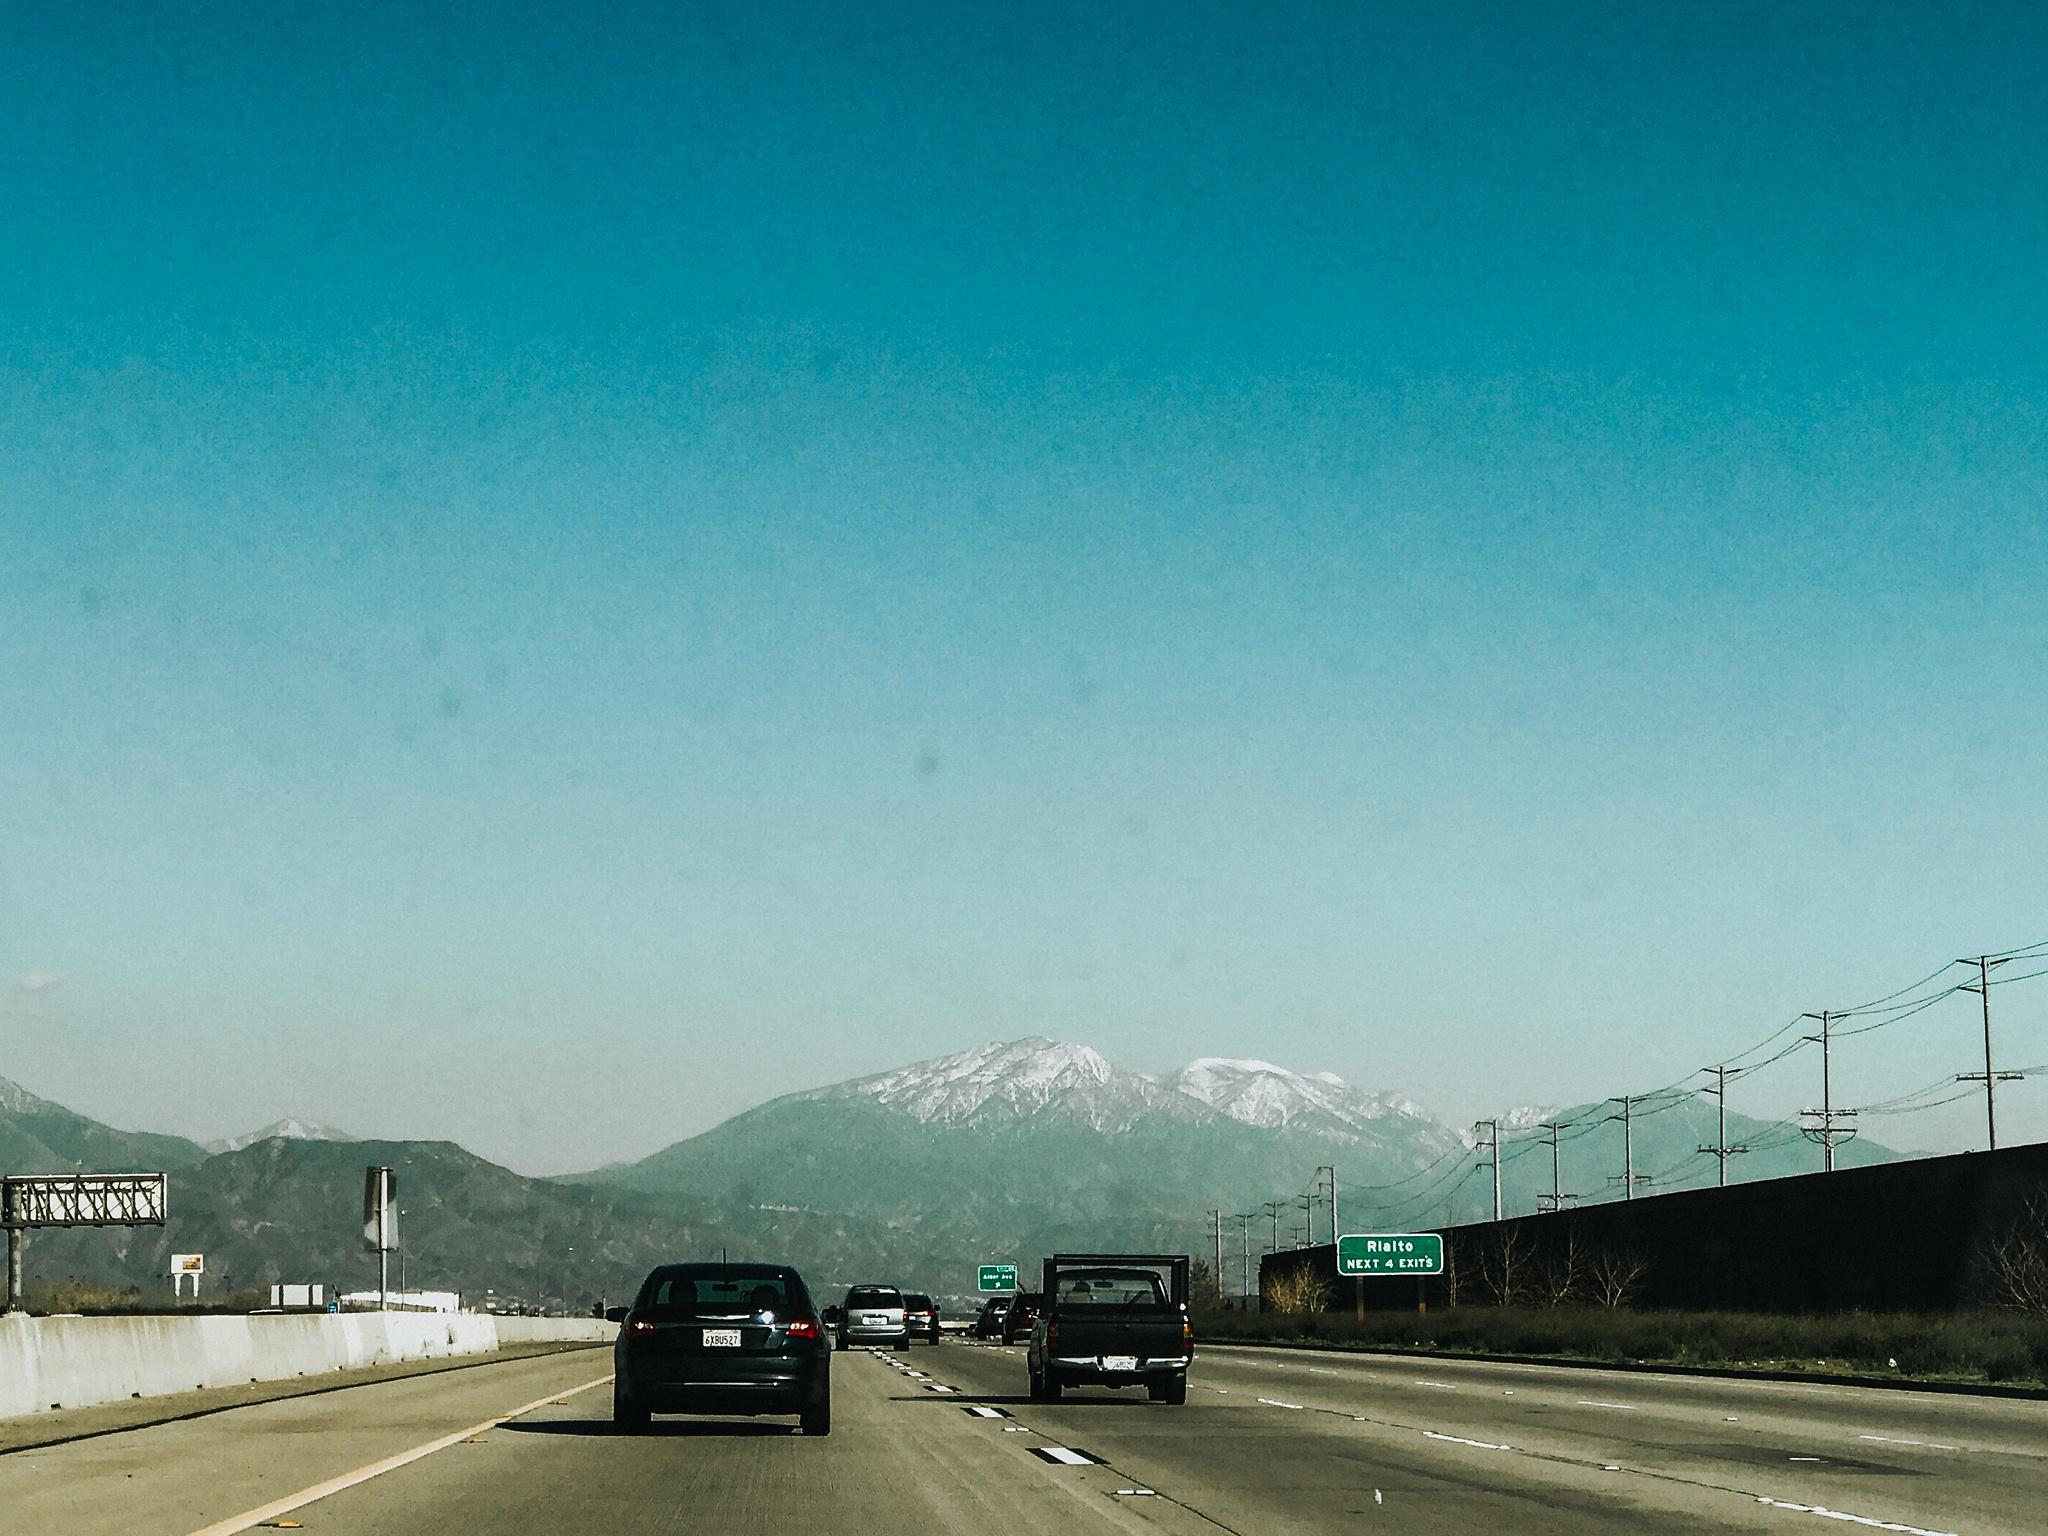 Headed through San Bernadino towards the snowy mountain tops.